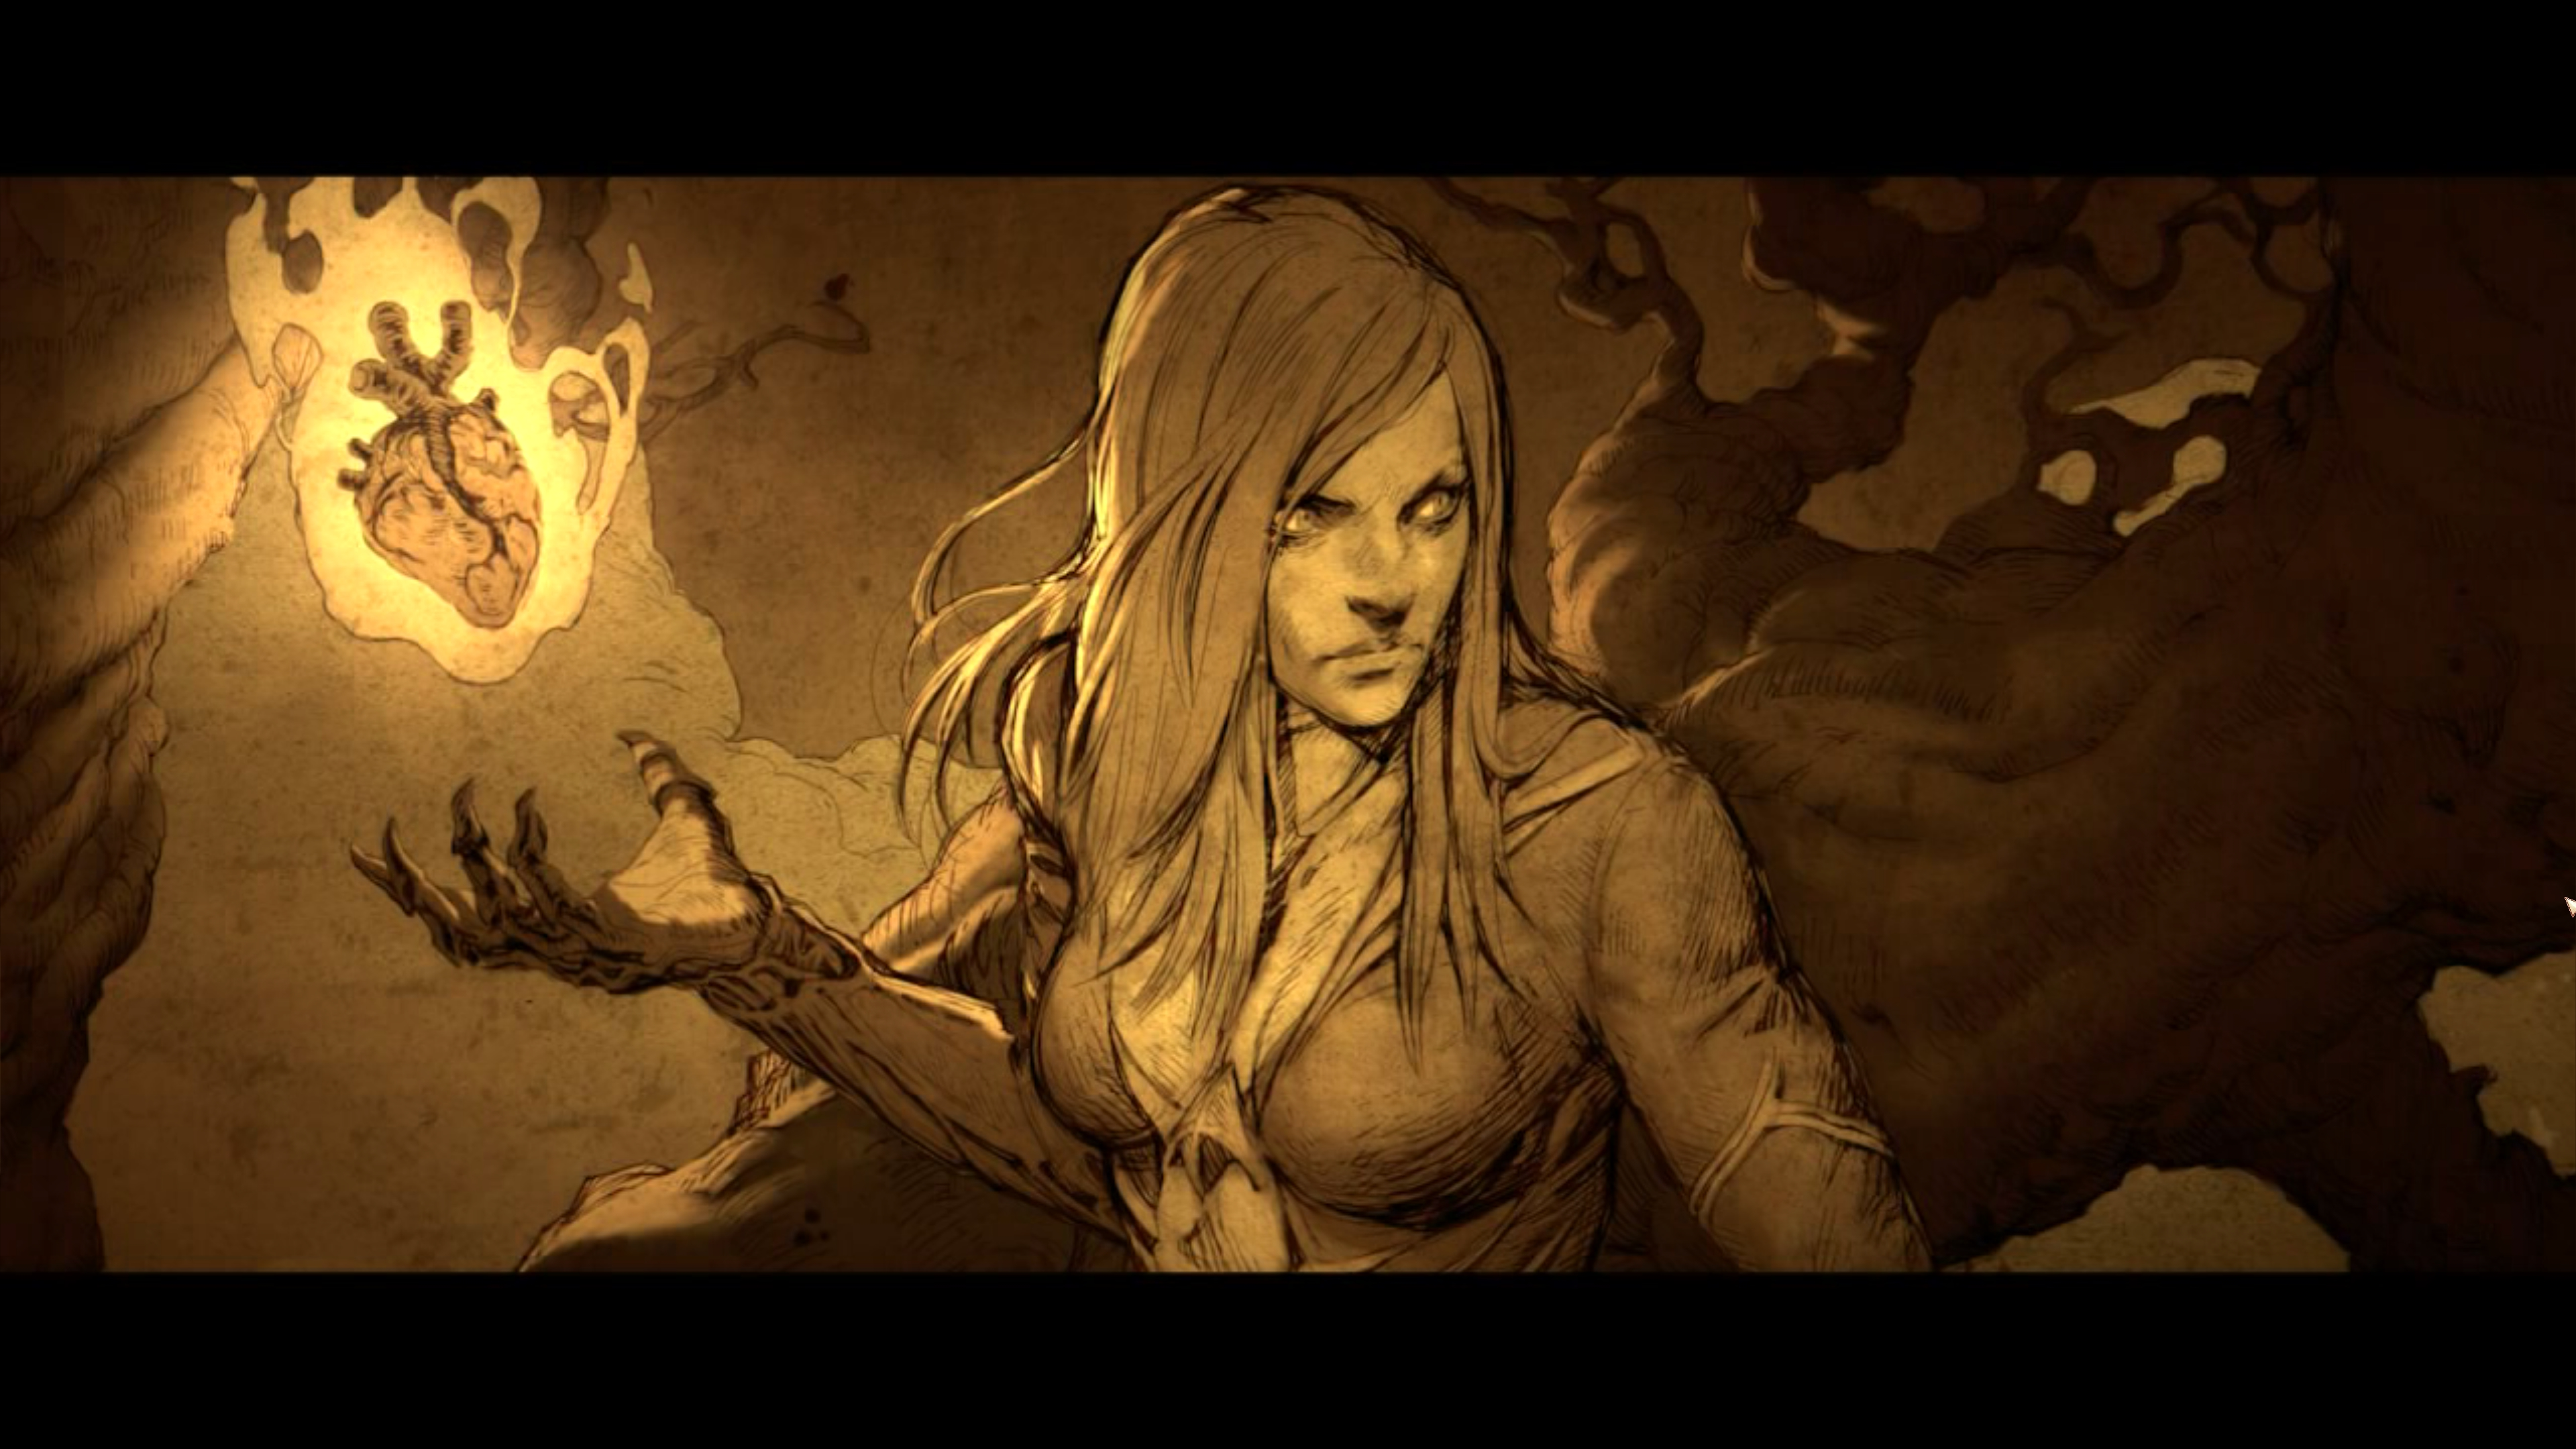 Diablo 3: Rise of the Necromancer review—roll them bones